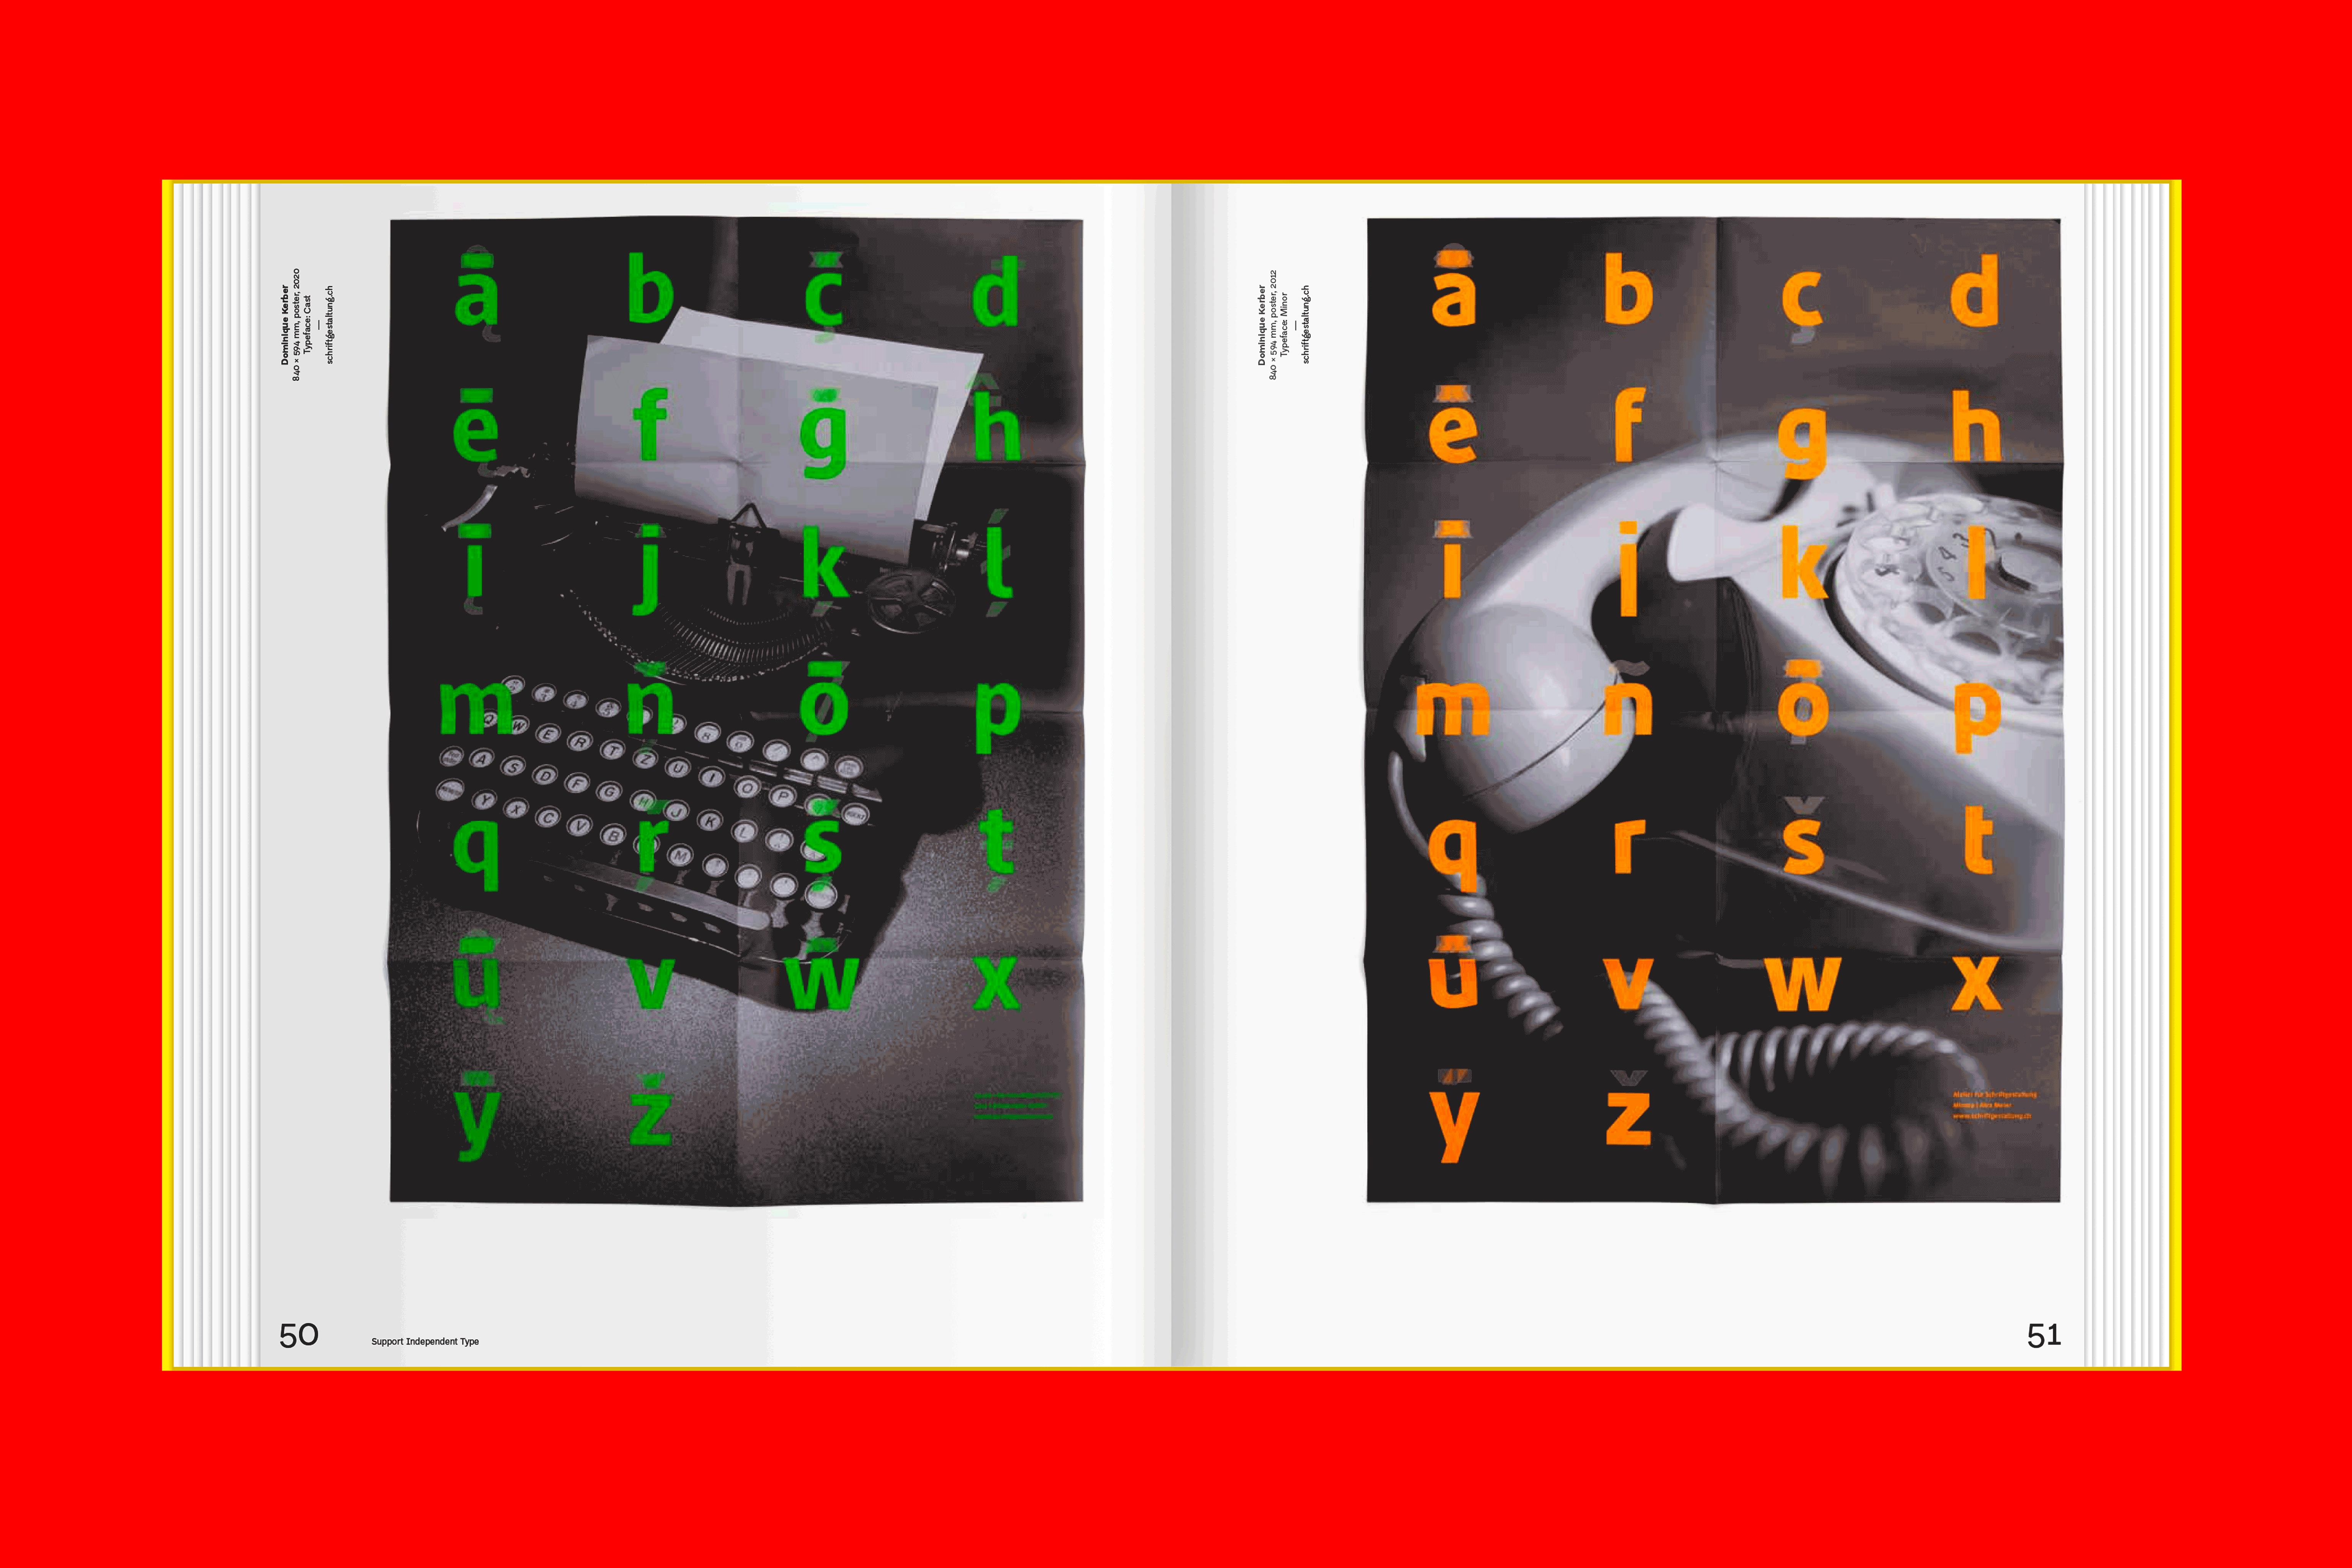 Slanted-Publiaktionen-Slanted-Publishers-Support-Independent-Type_12